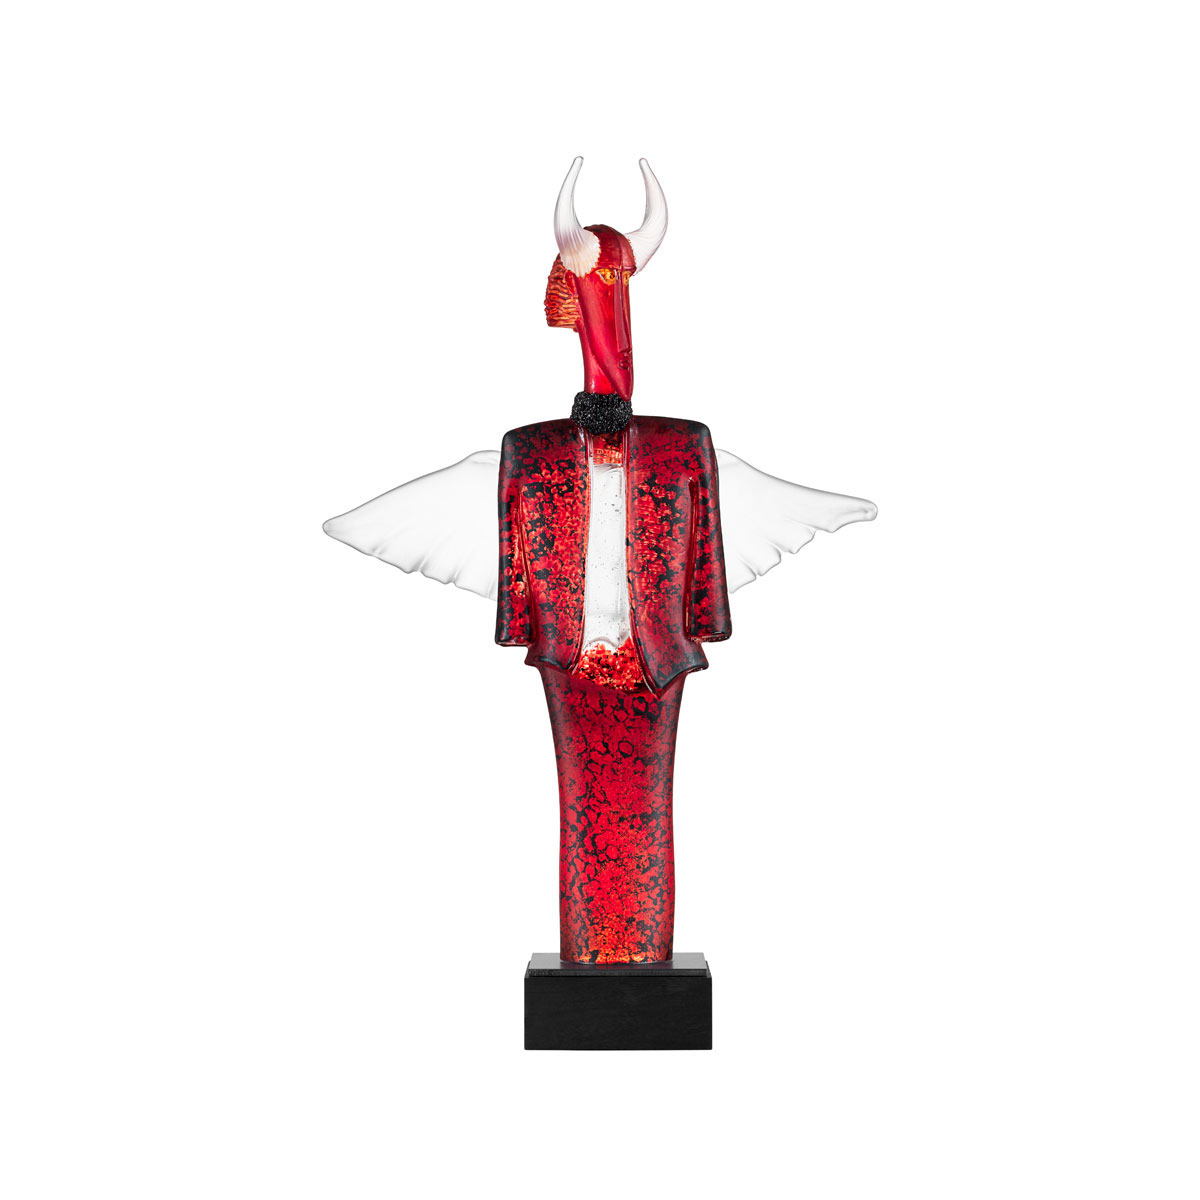 Kosta Boda Art Glass, Kjell Engman Check Man Red, Limited Edition